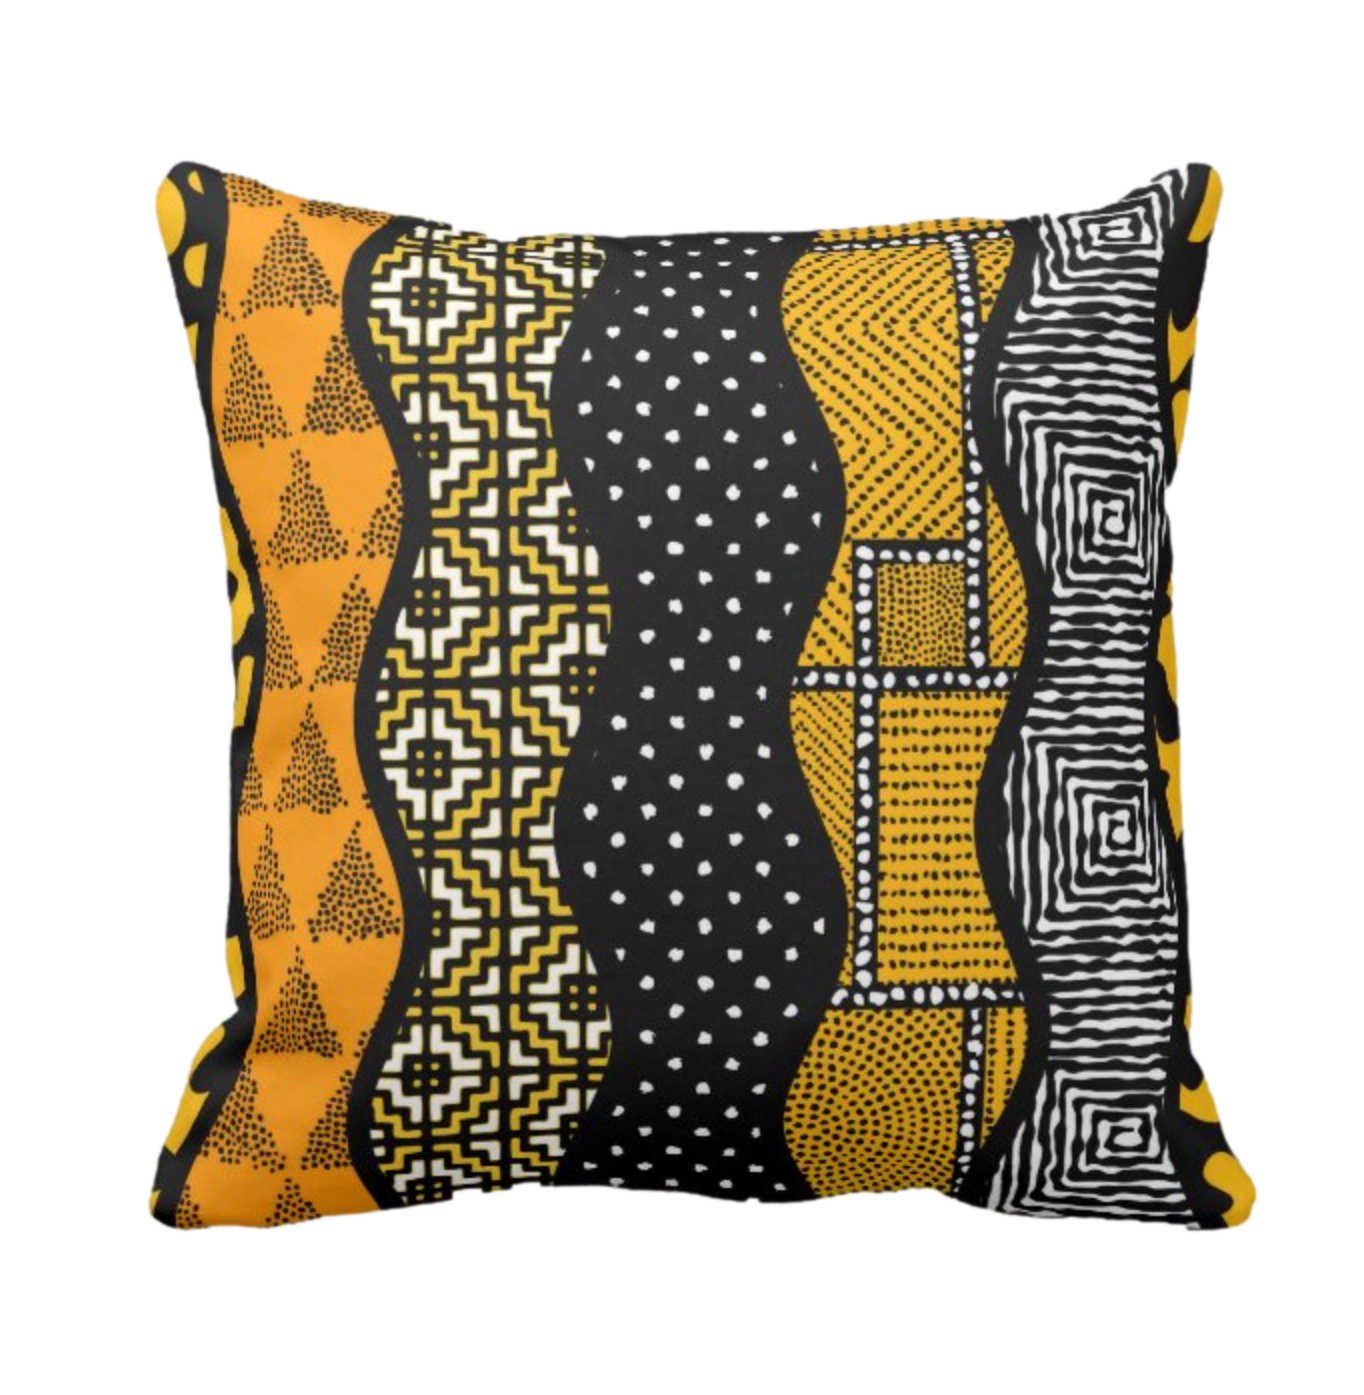 Afro Patchwork Print Design 5 Throw Cushion